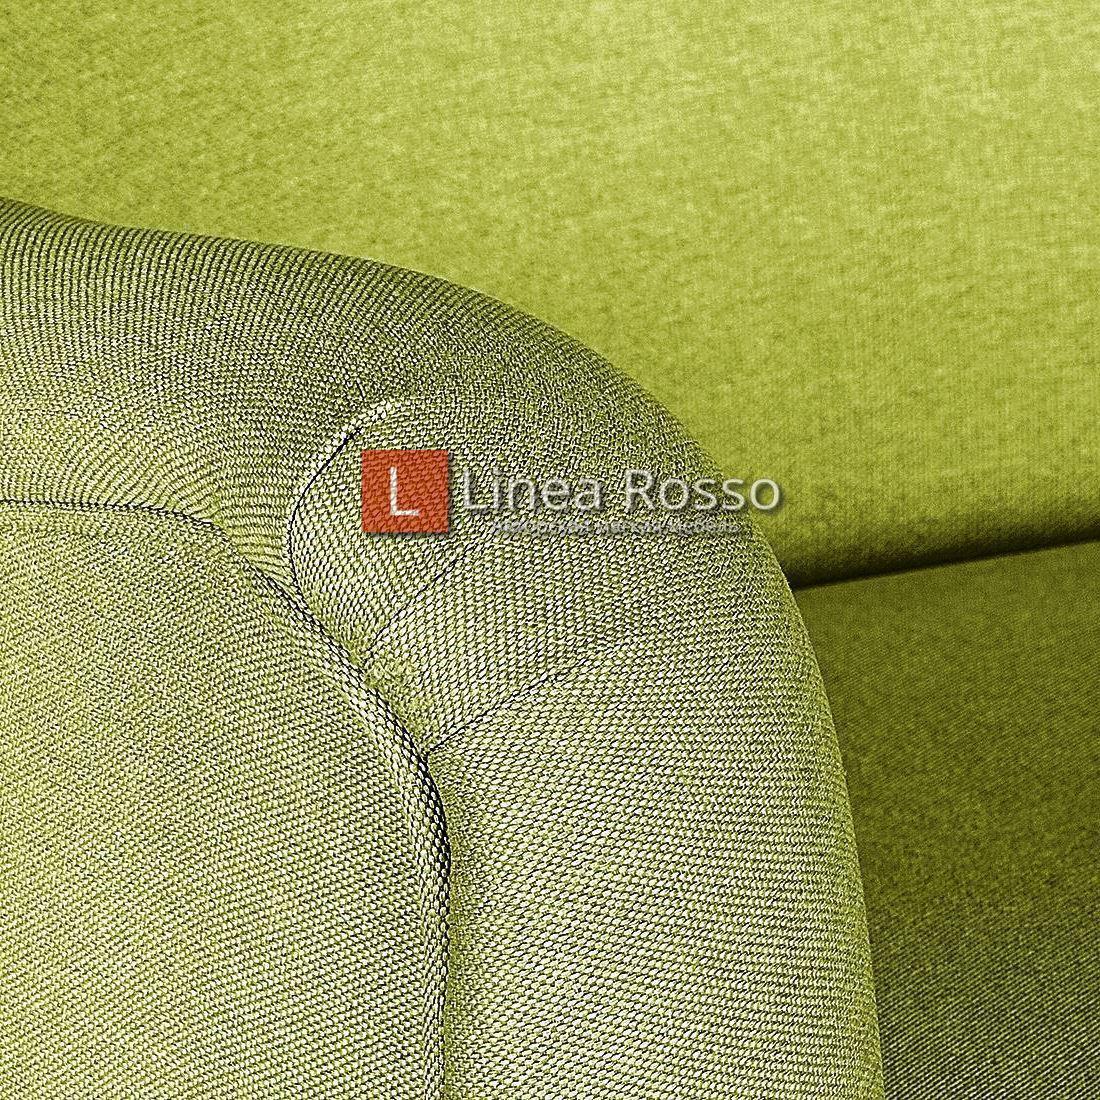 salatovoe kreslo9 - Кресло в салатовом цвете на заказ